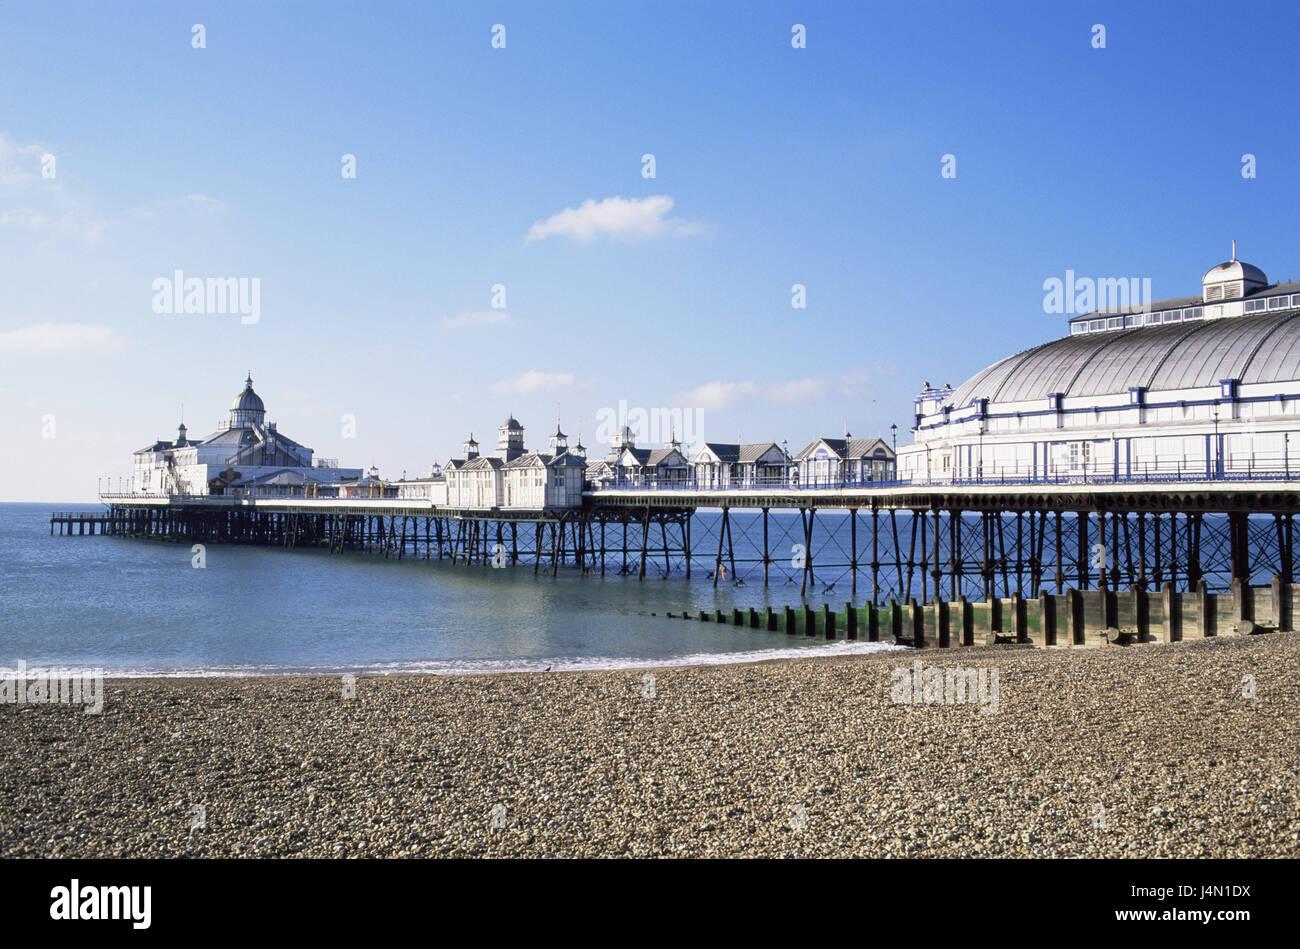 Großbritannien, England, Sussex, Eastbourne, Seebrücke, Restaurants, Süden schmale Land, Meer, Atlantik, Stockbild